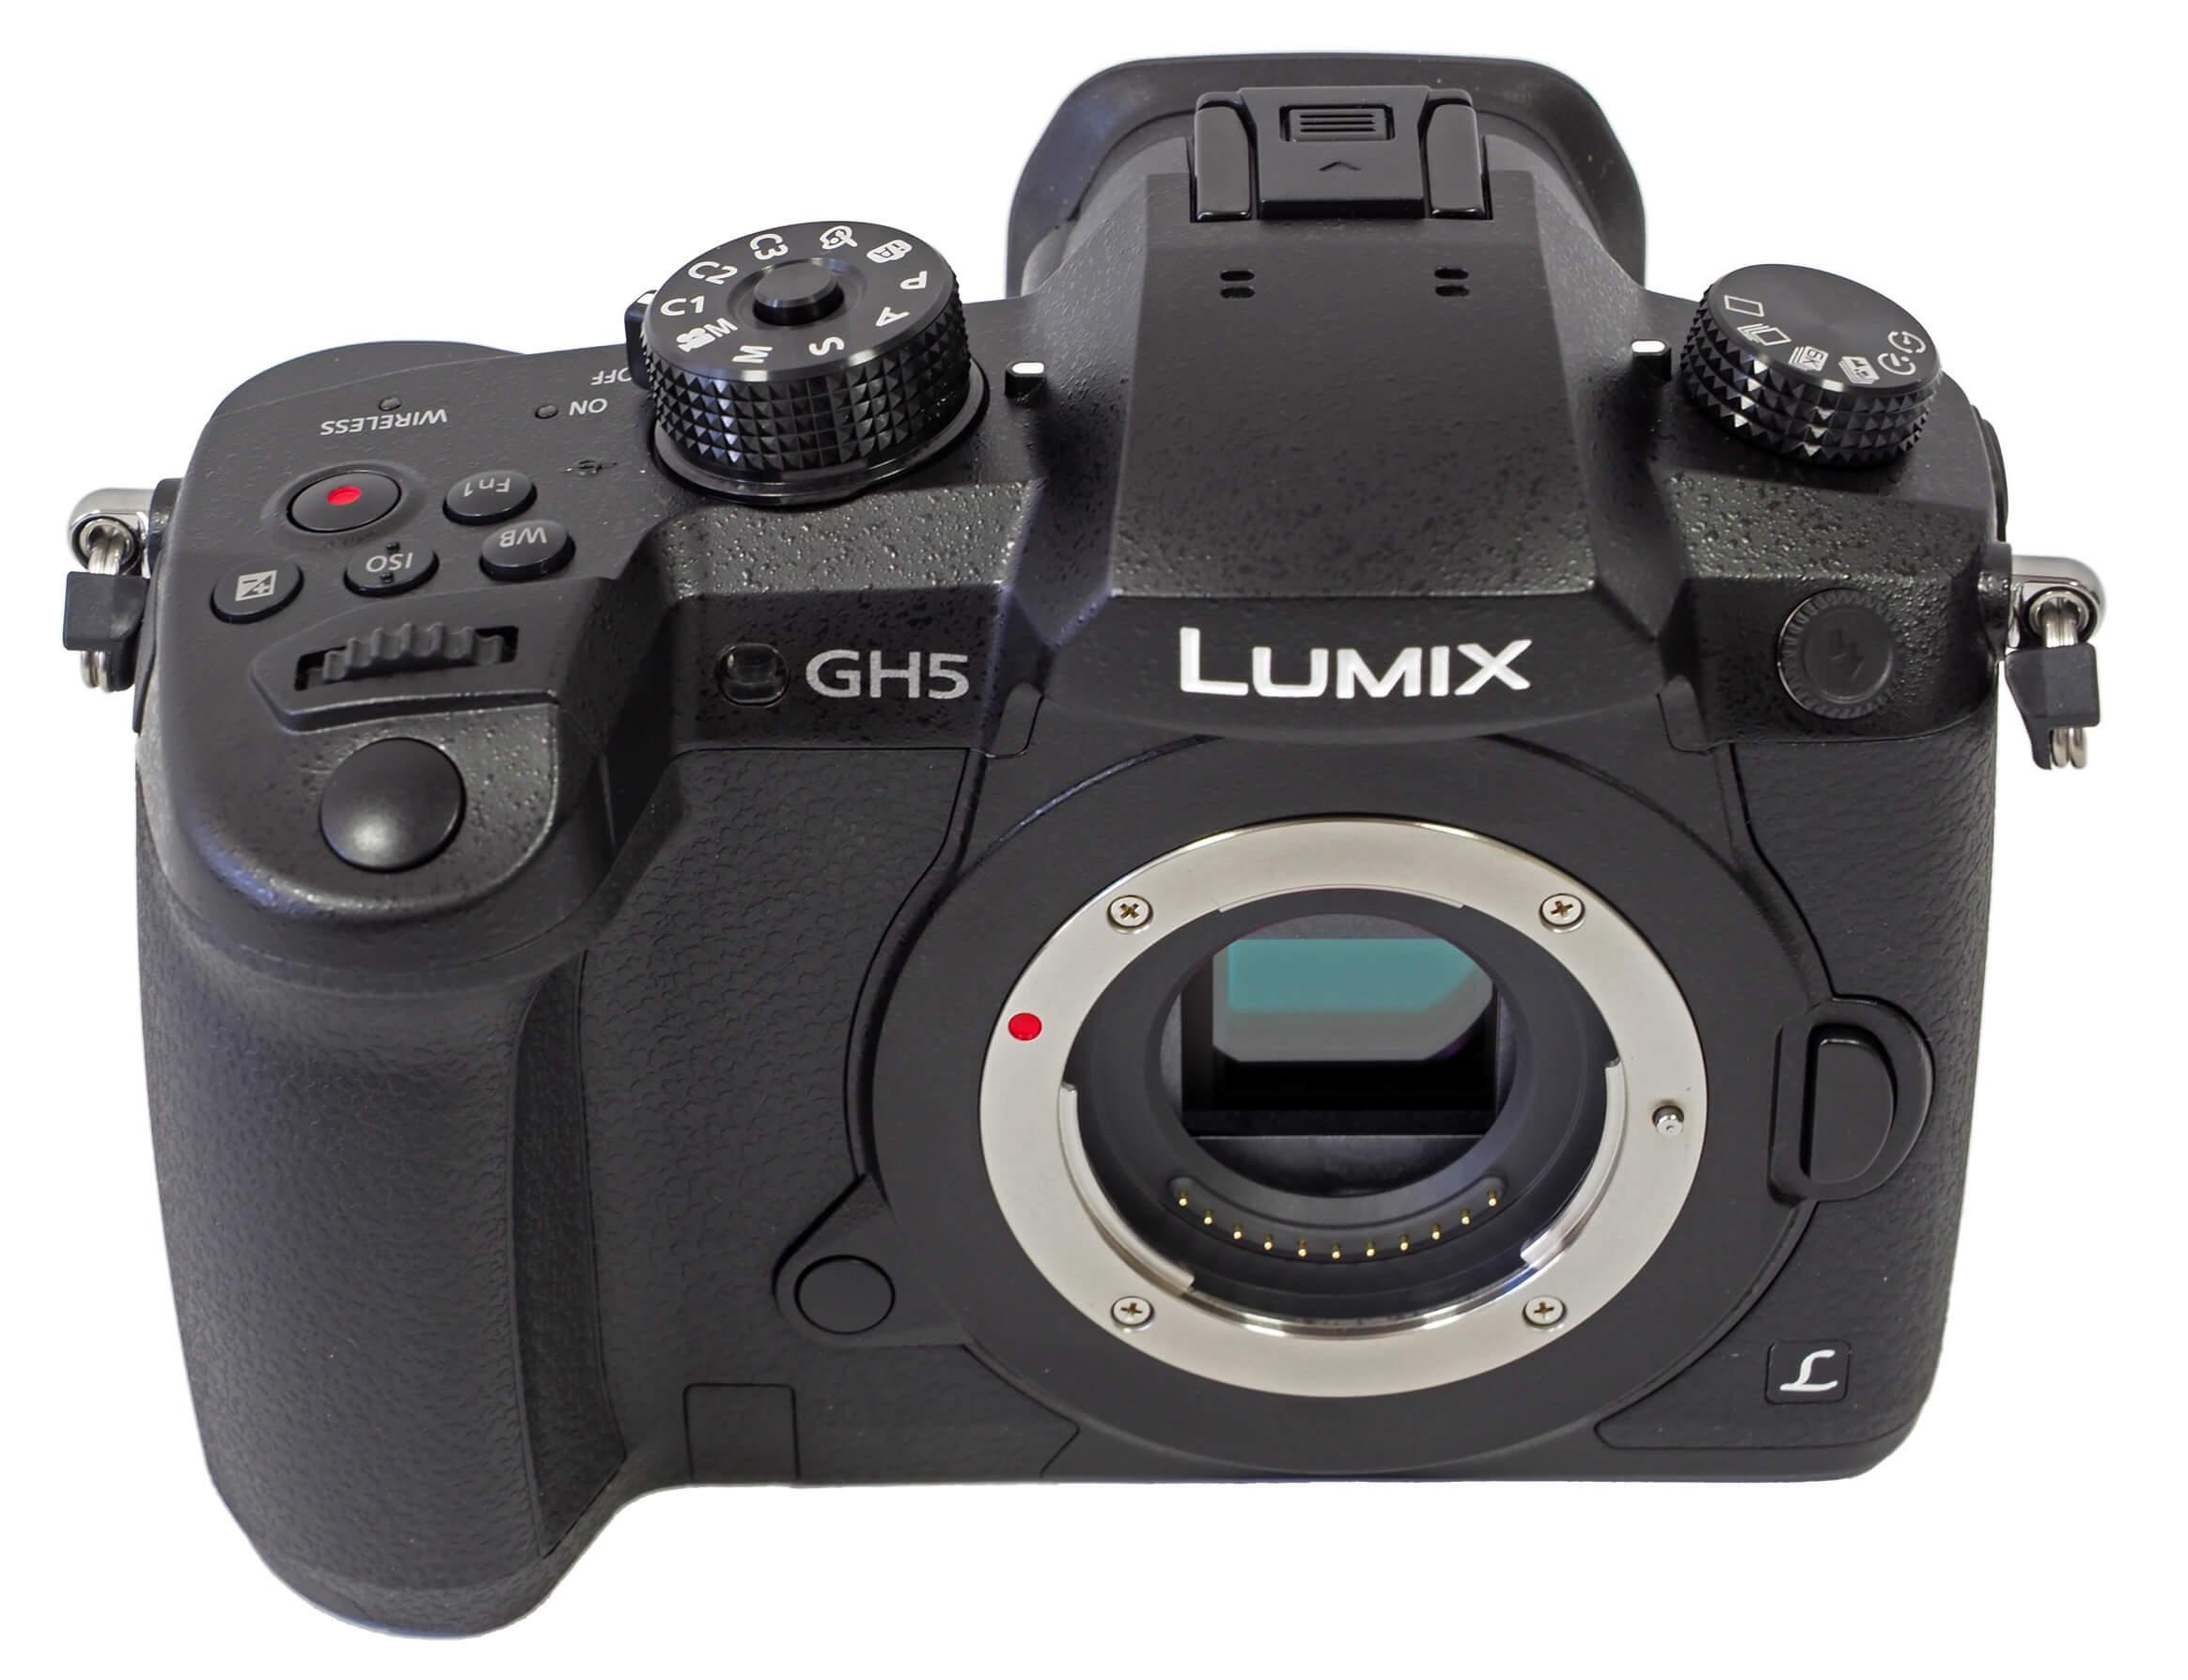 10 Kamera Panasonic Lumix Terbaik 2021 (Harga 5 - 30 Jutaan)